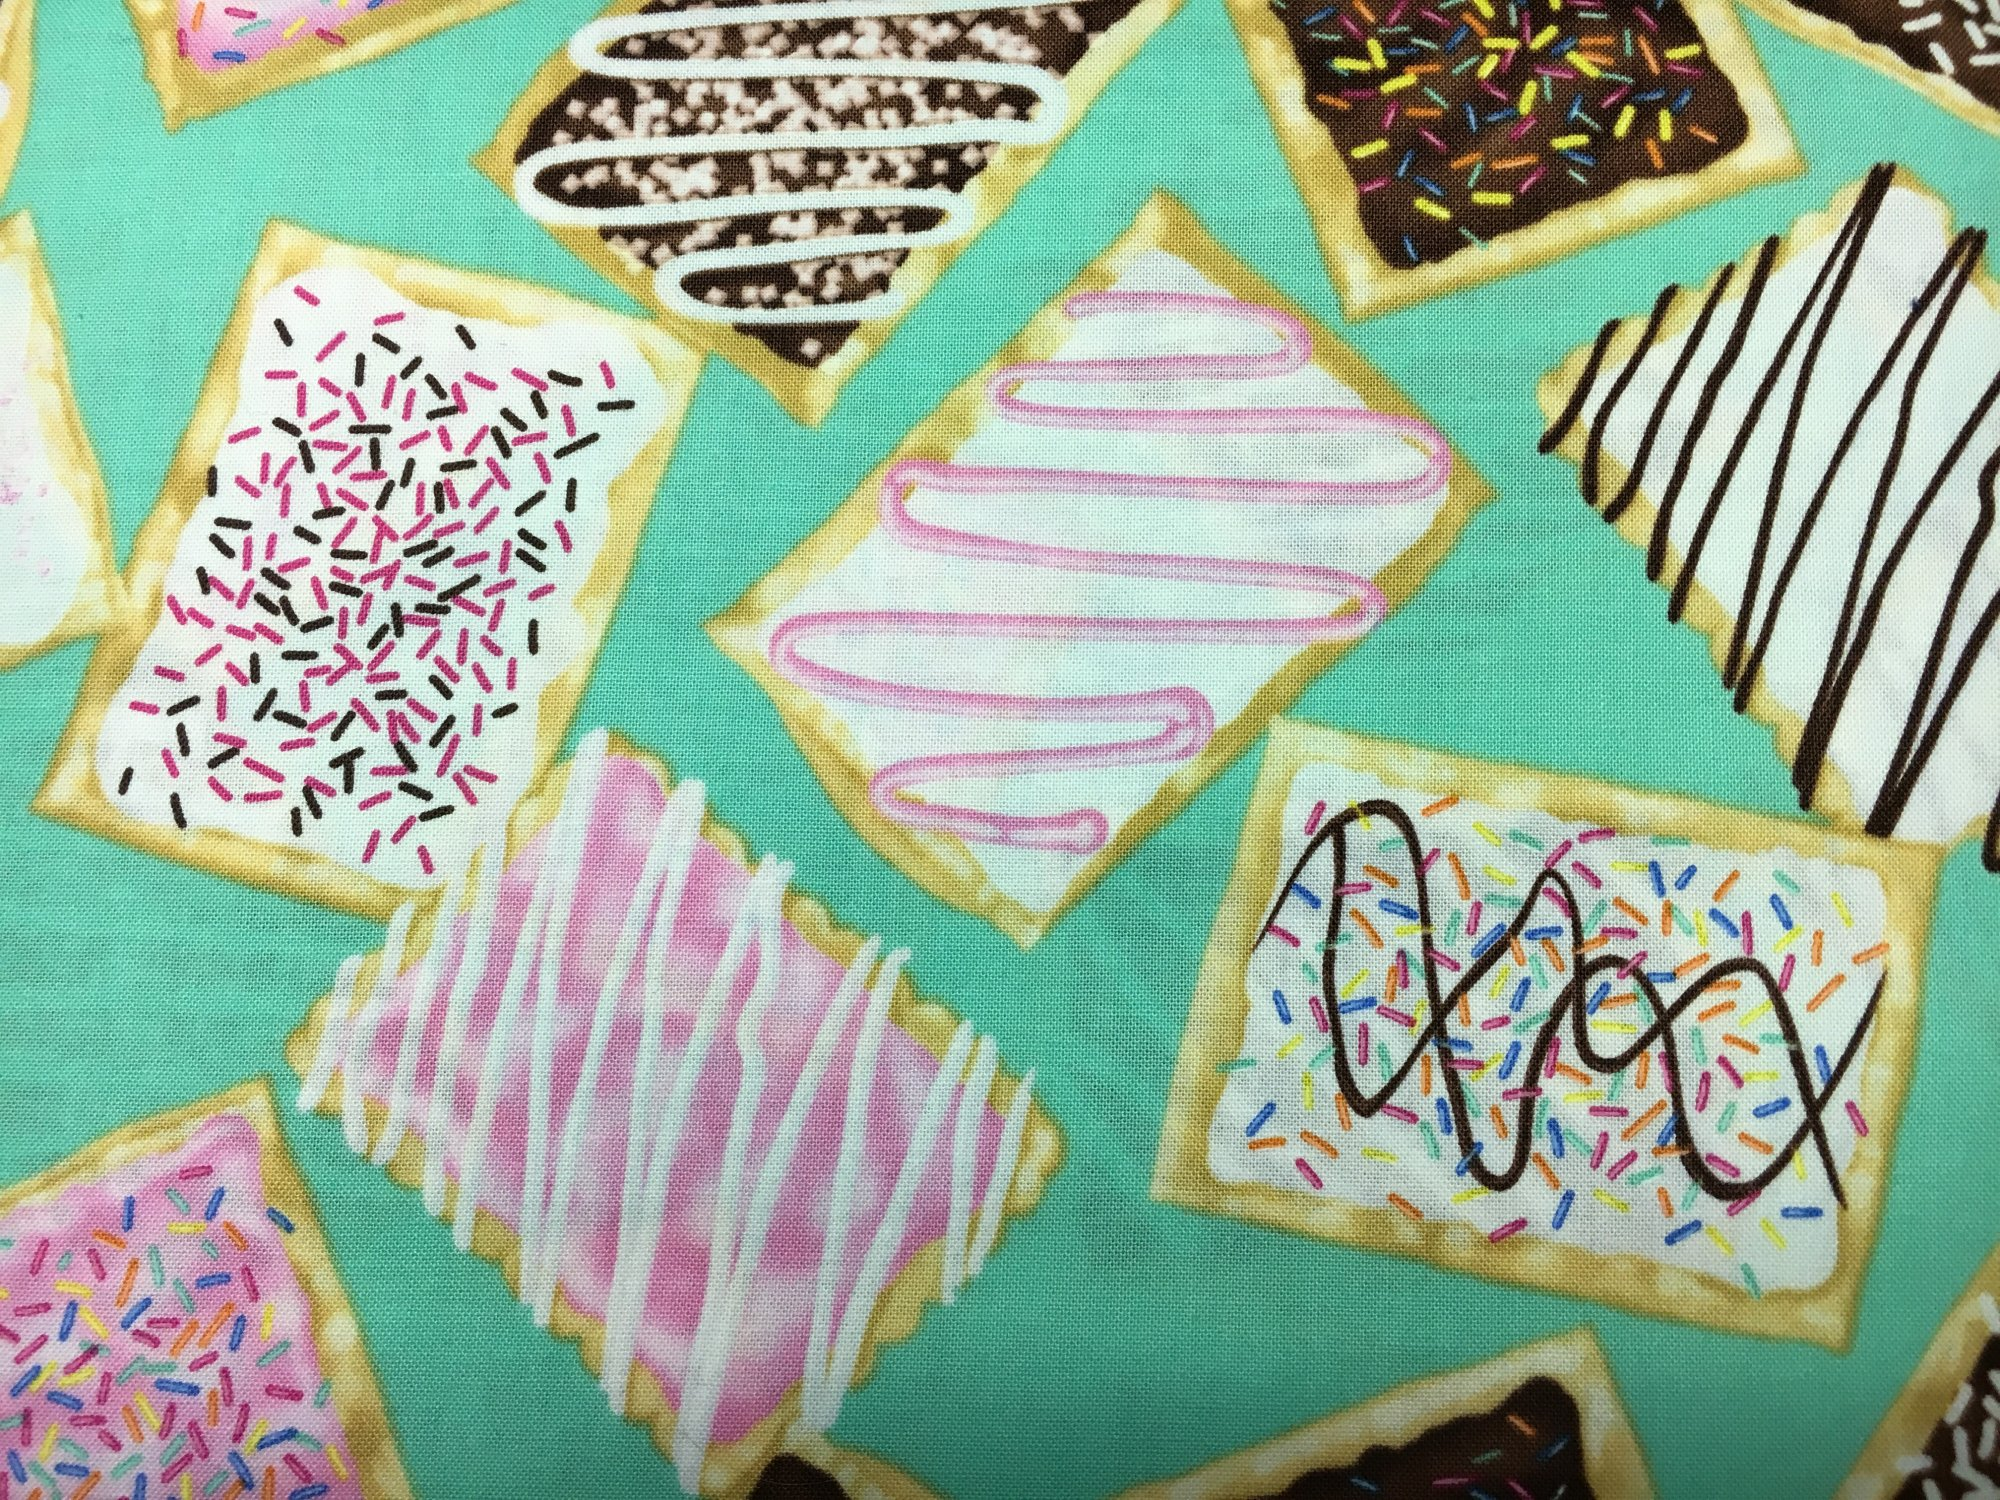 Kanvas; Breakfast Club; pastries